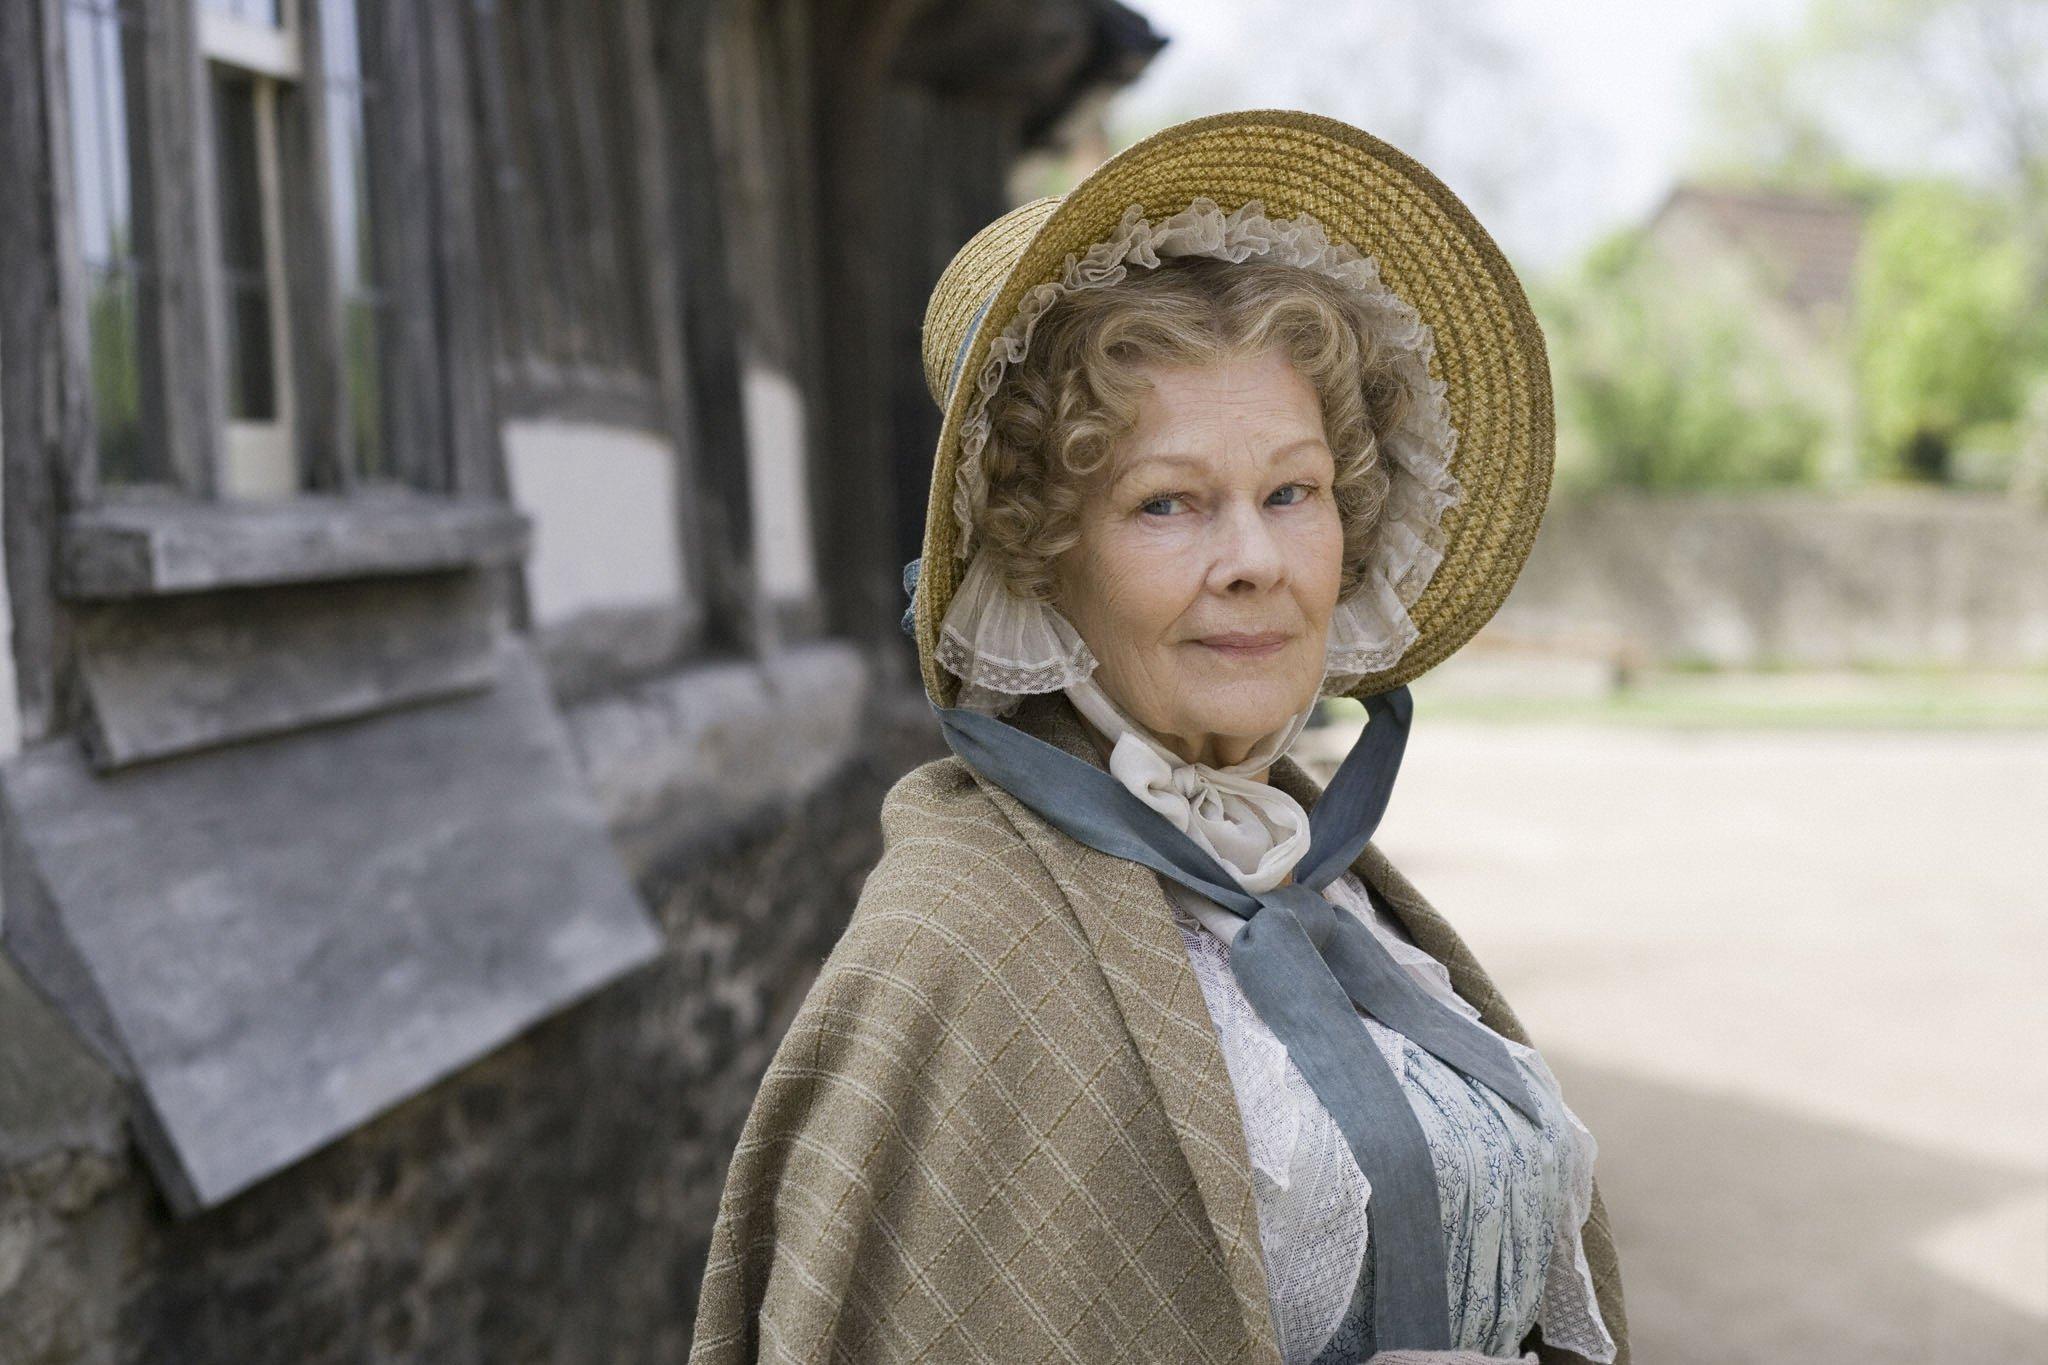 Cranford returns to BBC1 for Christmas special